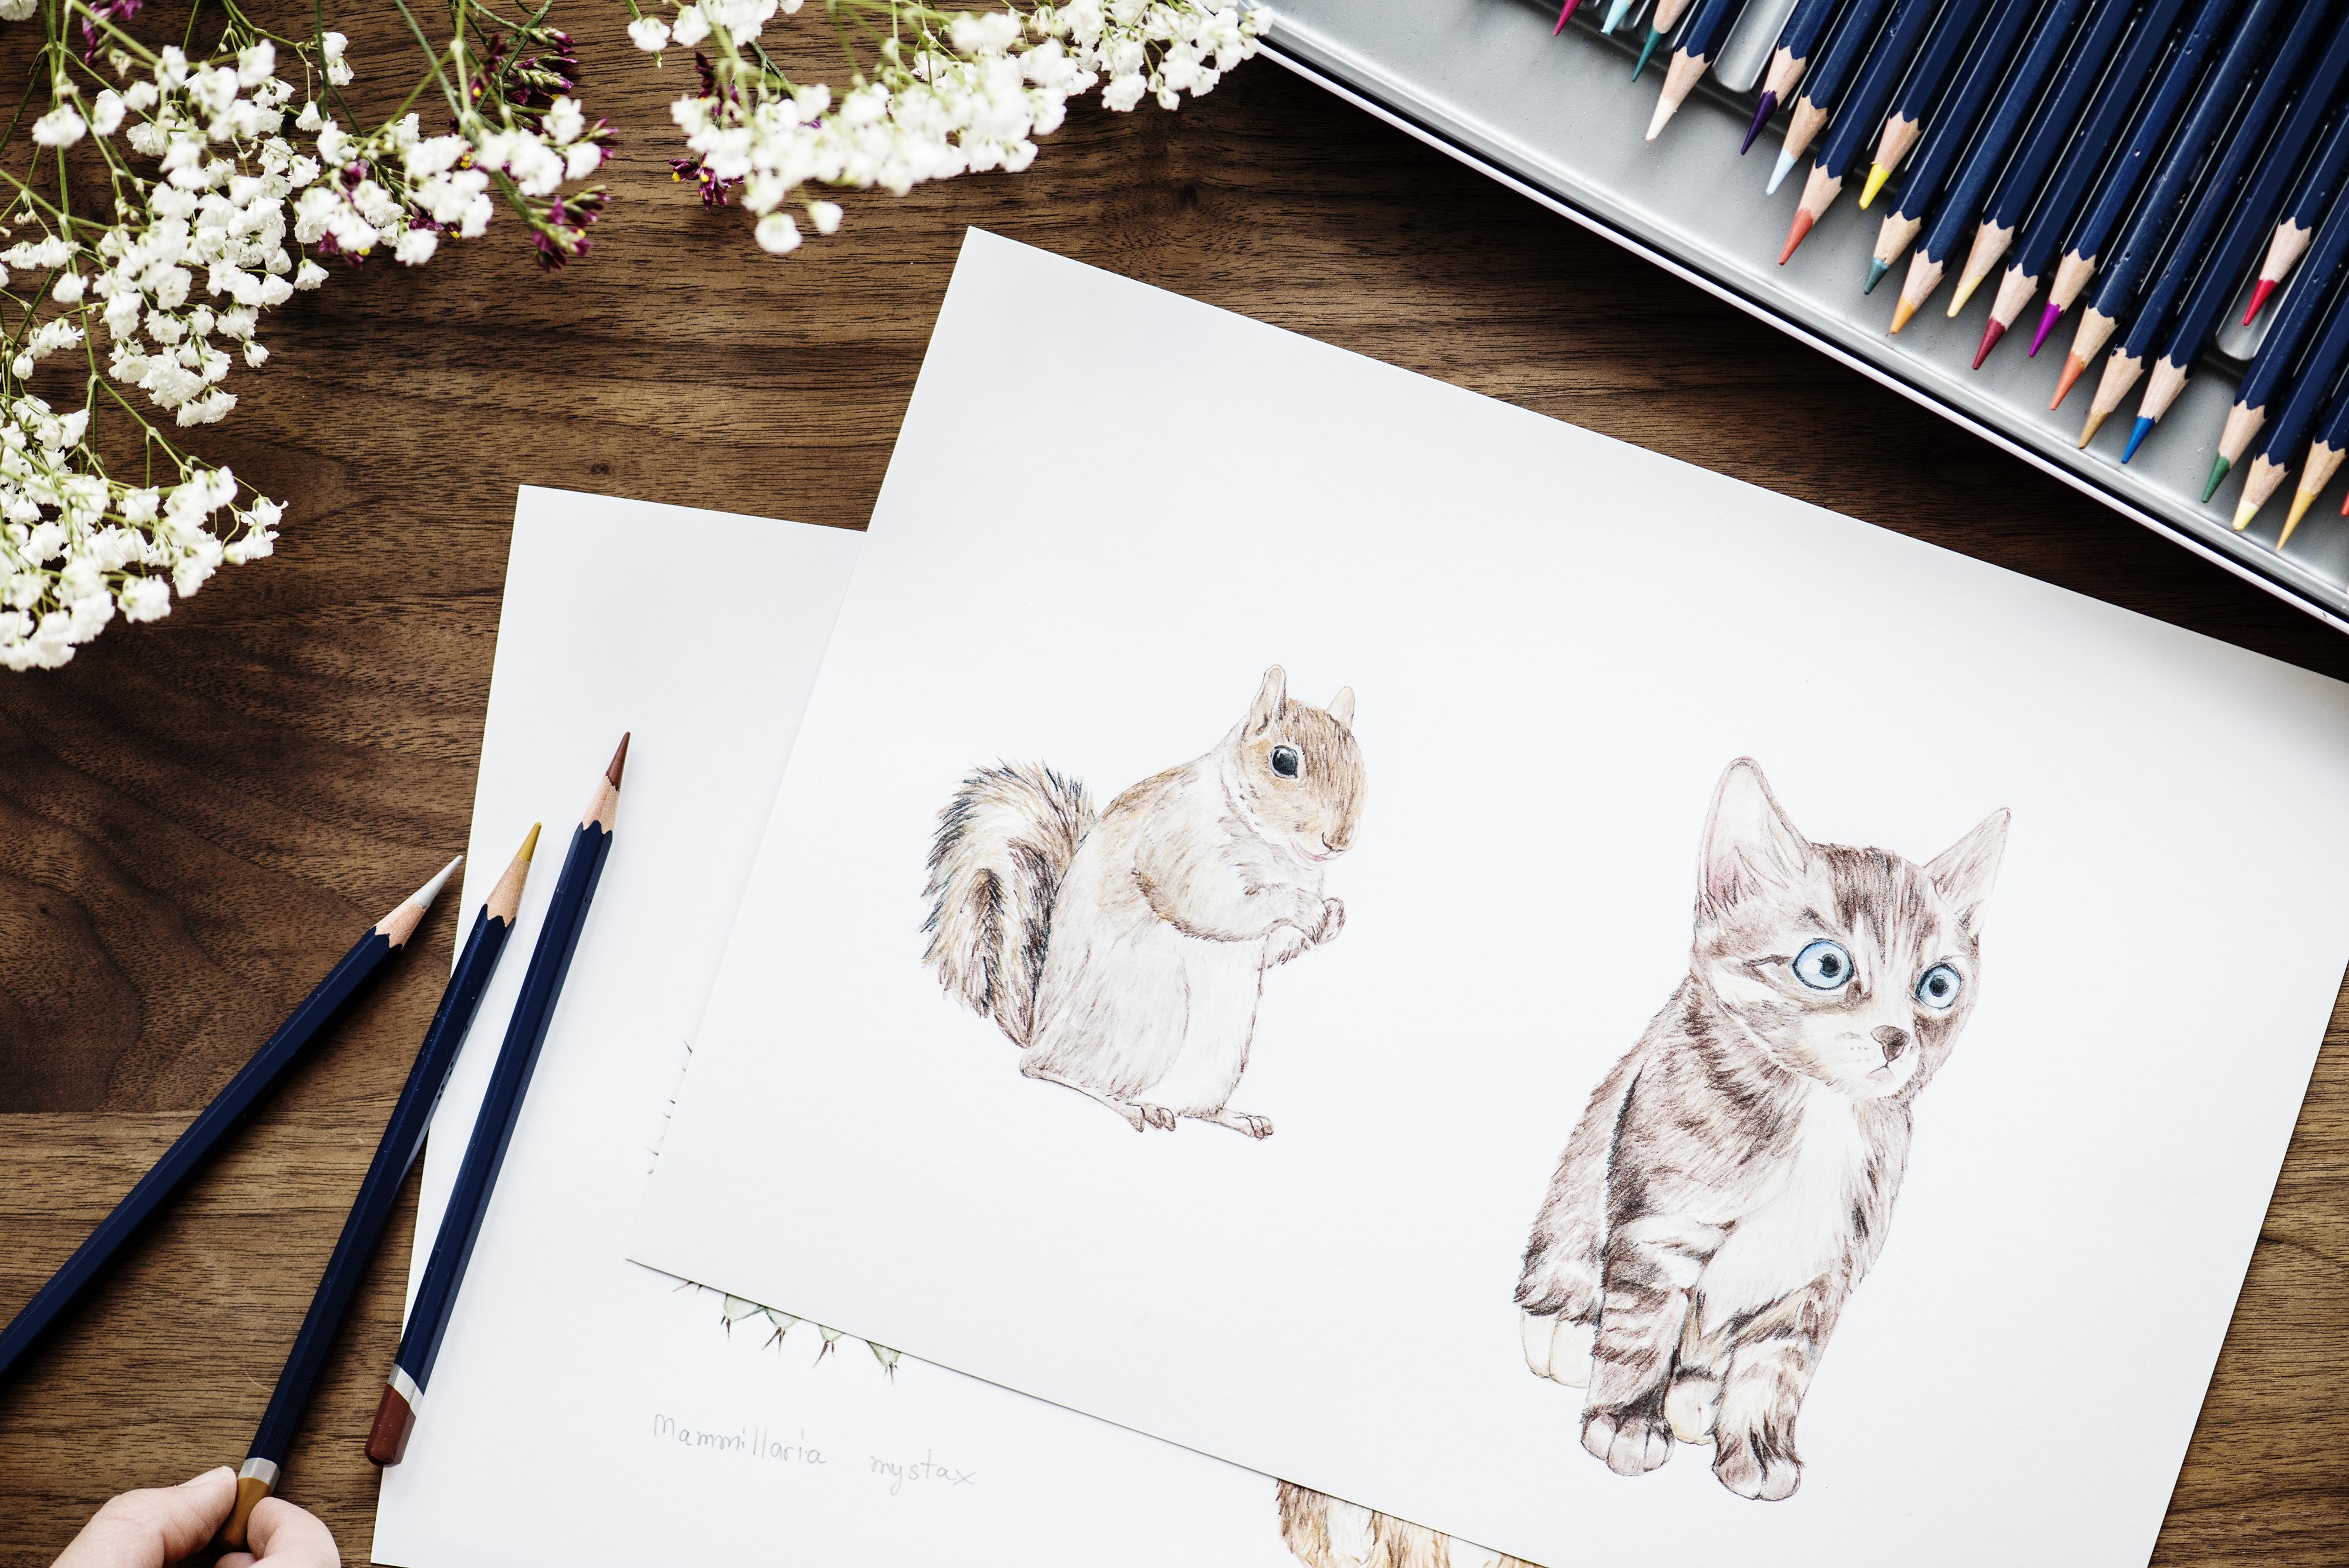 Free Images Adorable Animal Art Artist Bright Cat